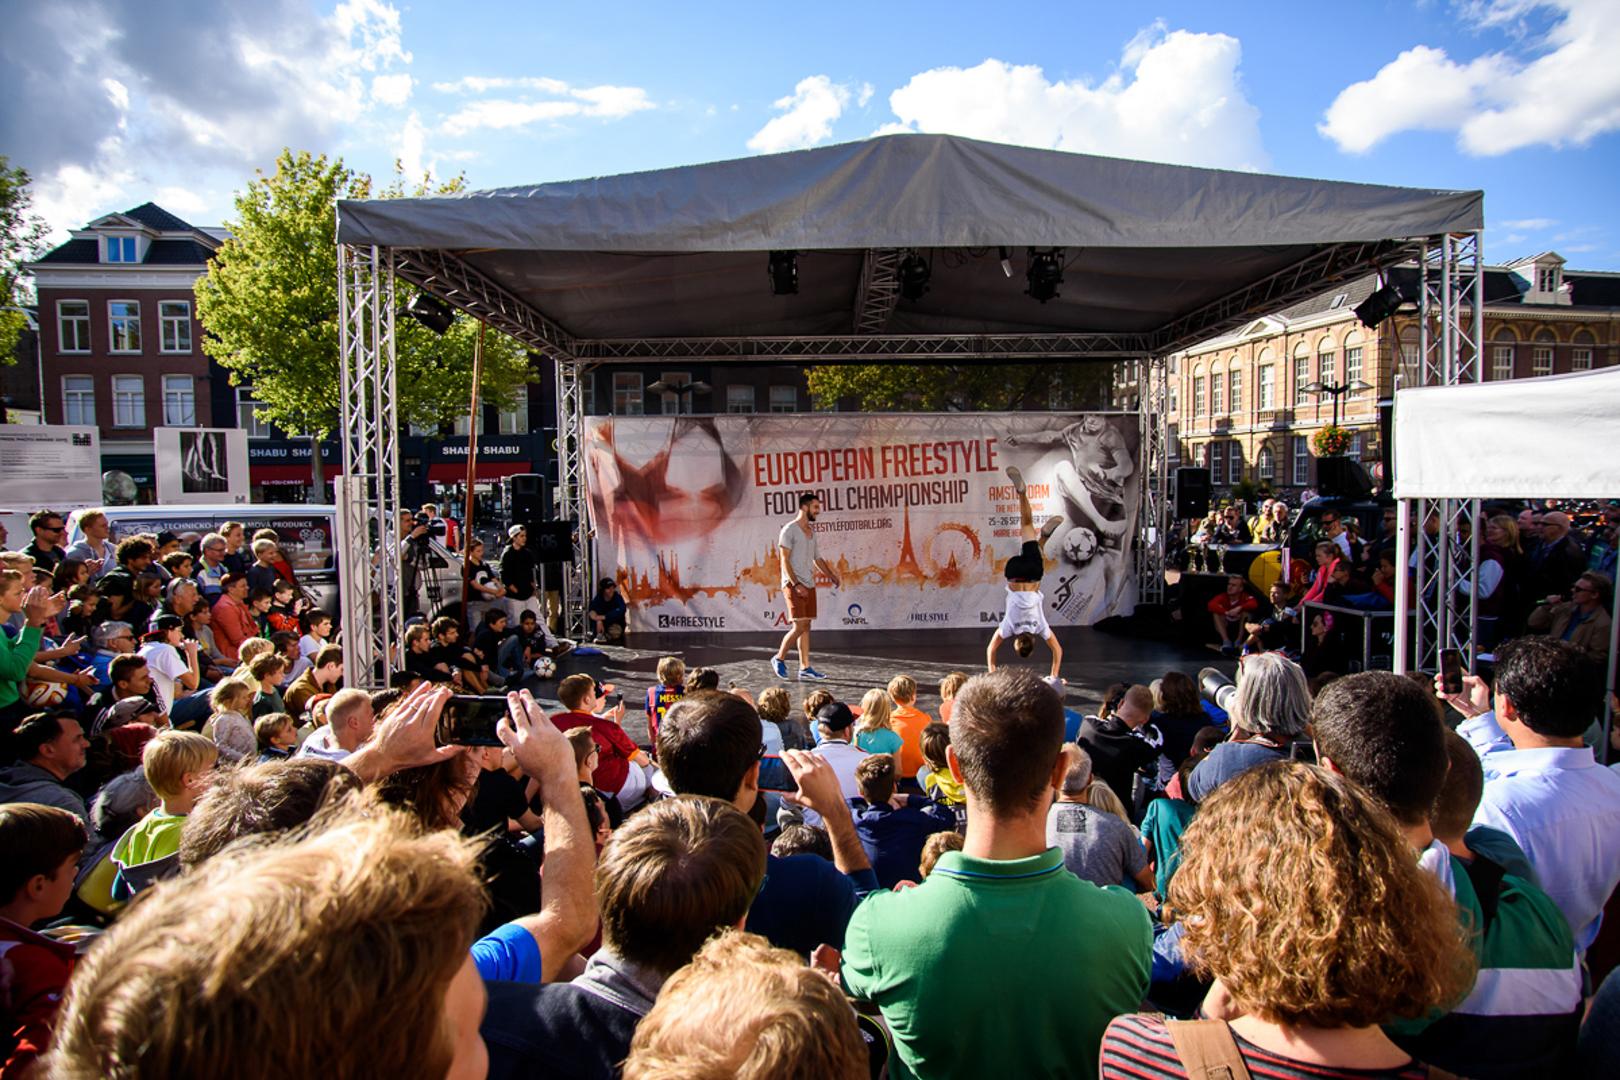 European Freestyle Football Championship